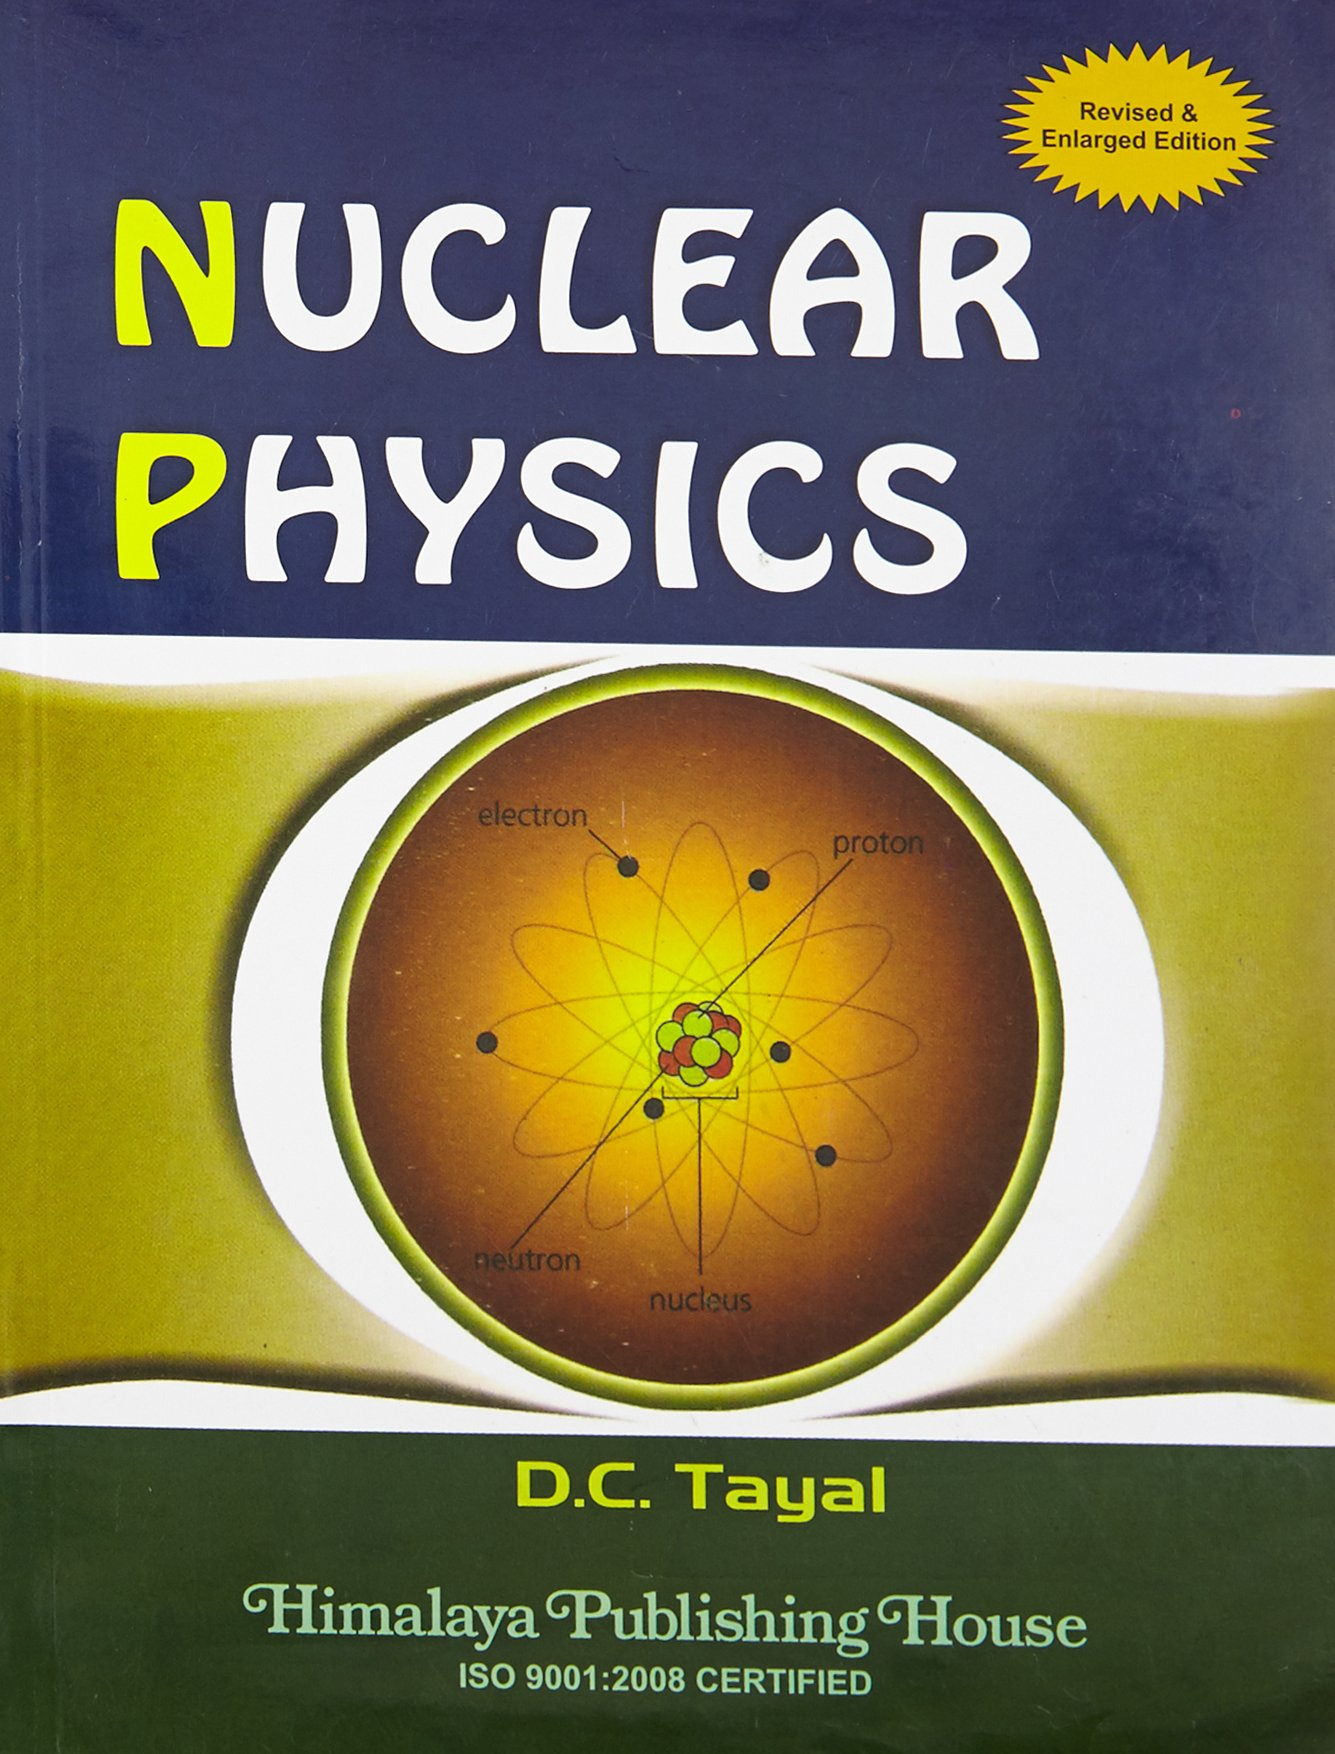 nuclear physics d c tayal